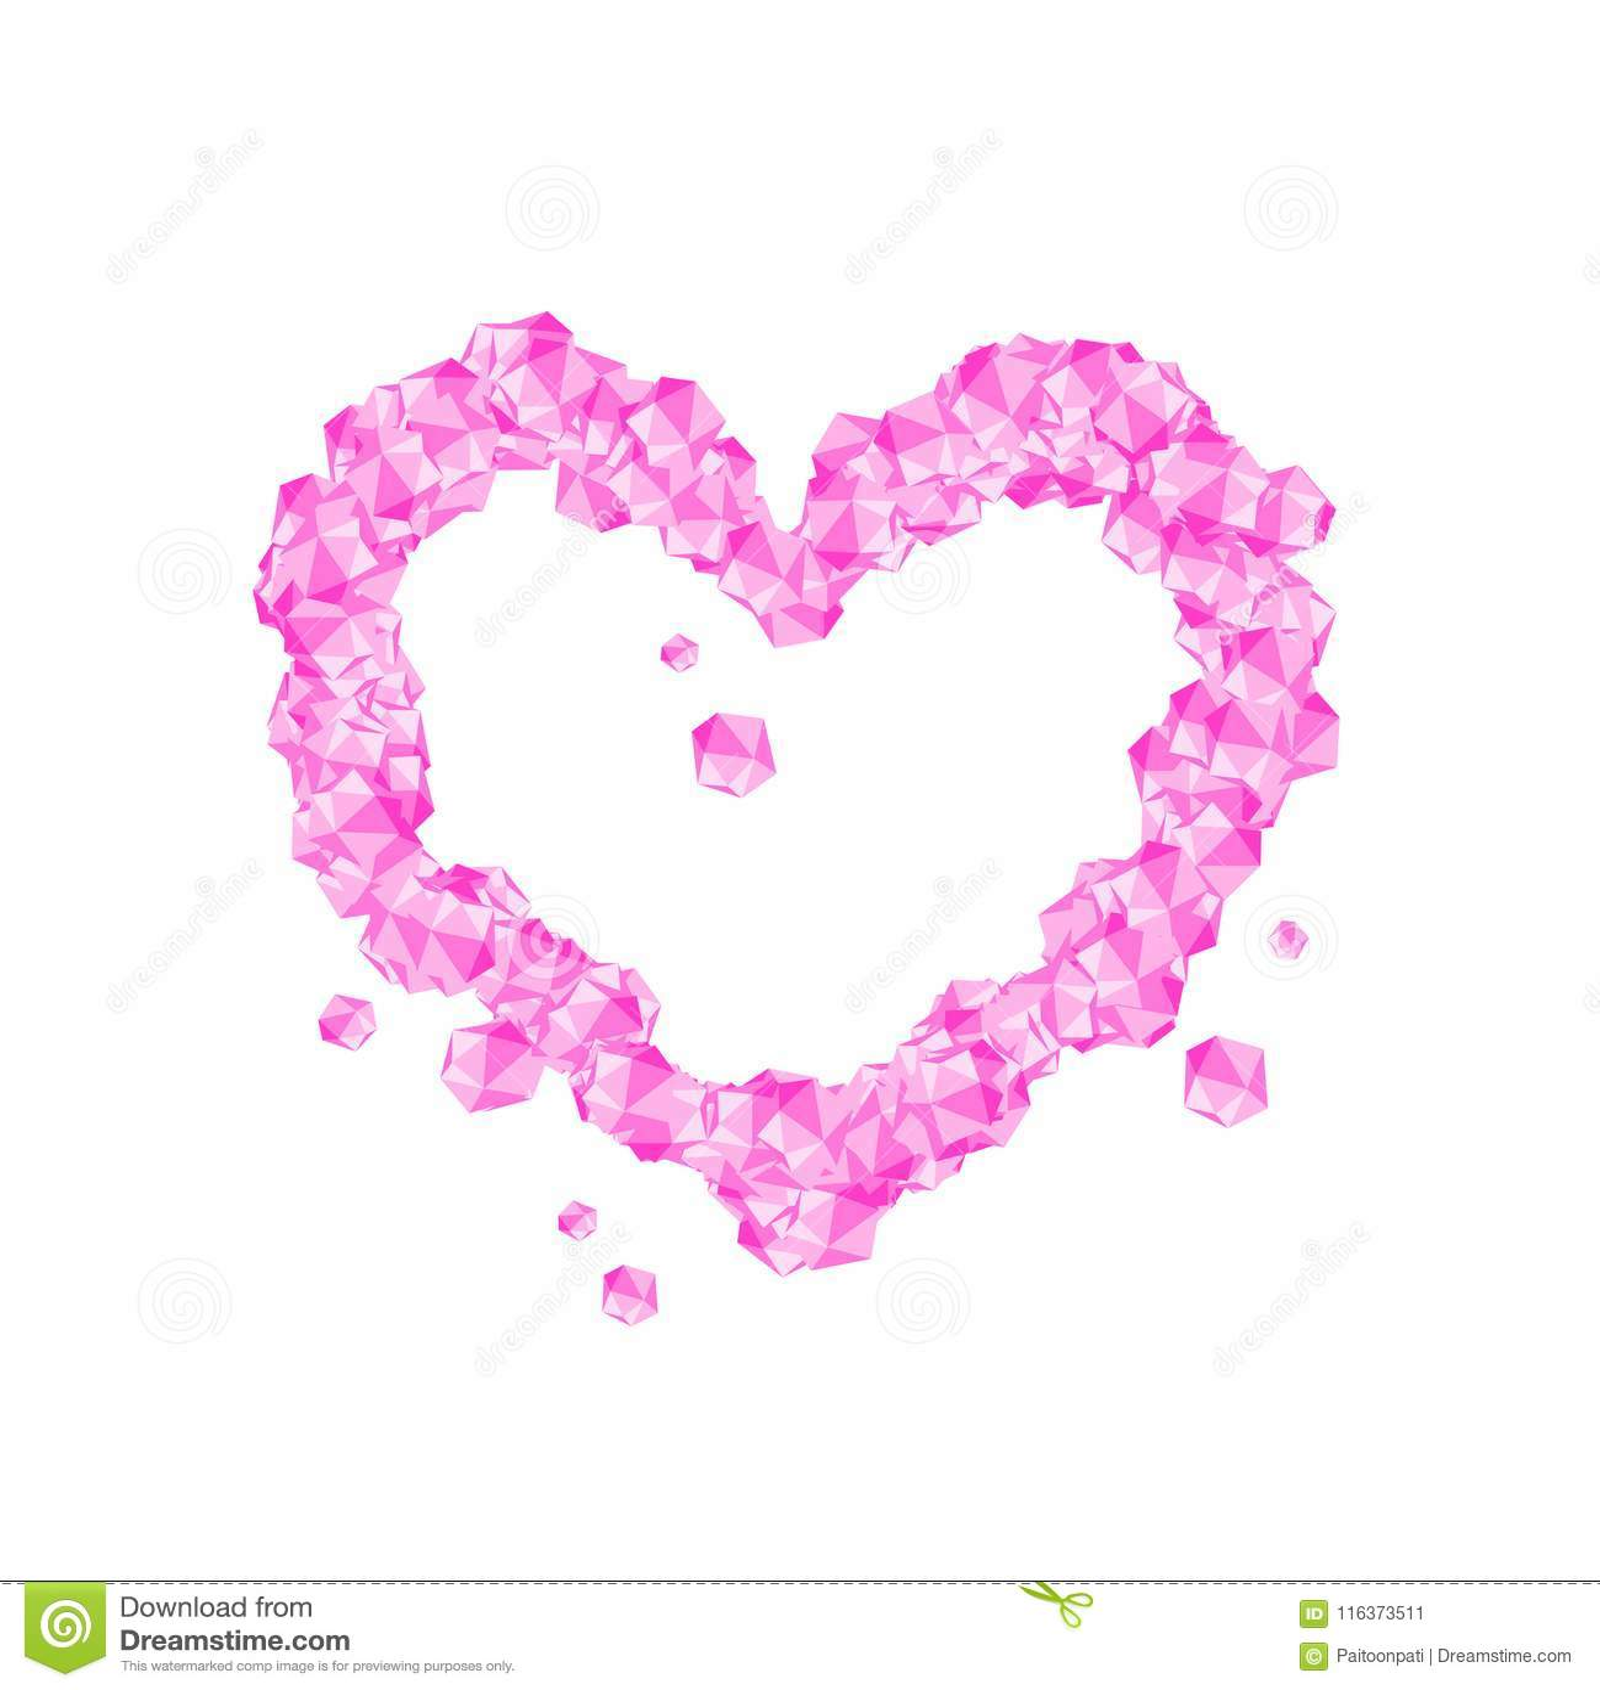 Love Heart Symbol Crystal Diamond 3d Virtual Set Illustration Stock